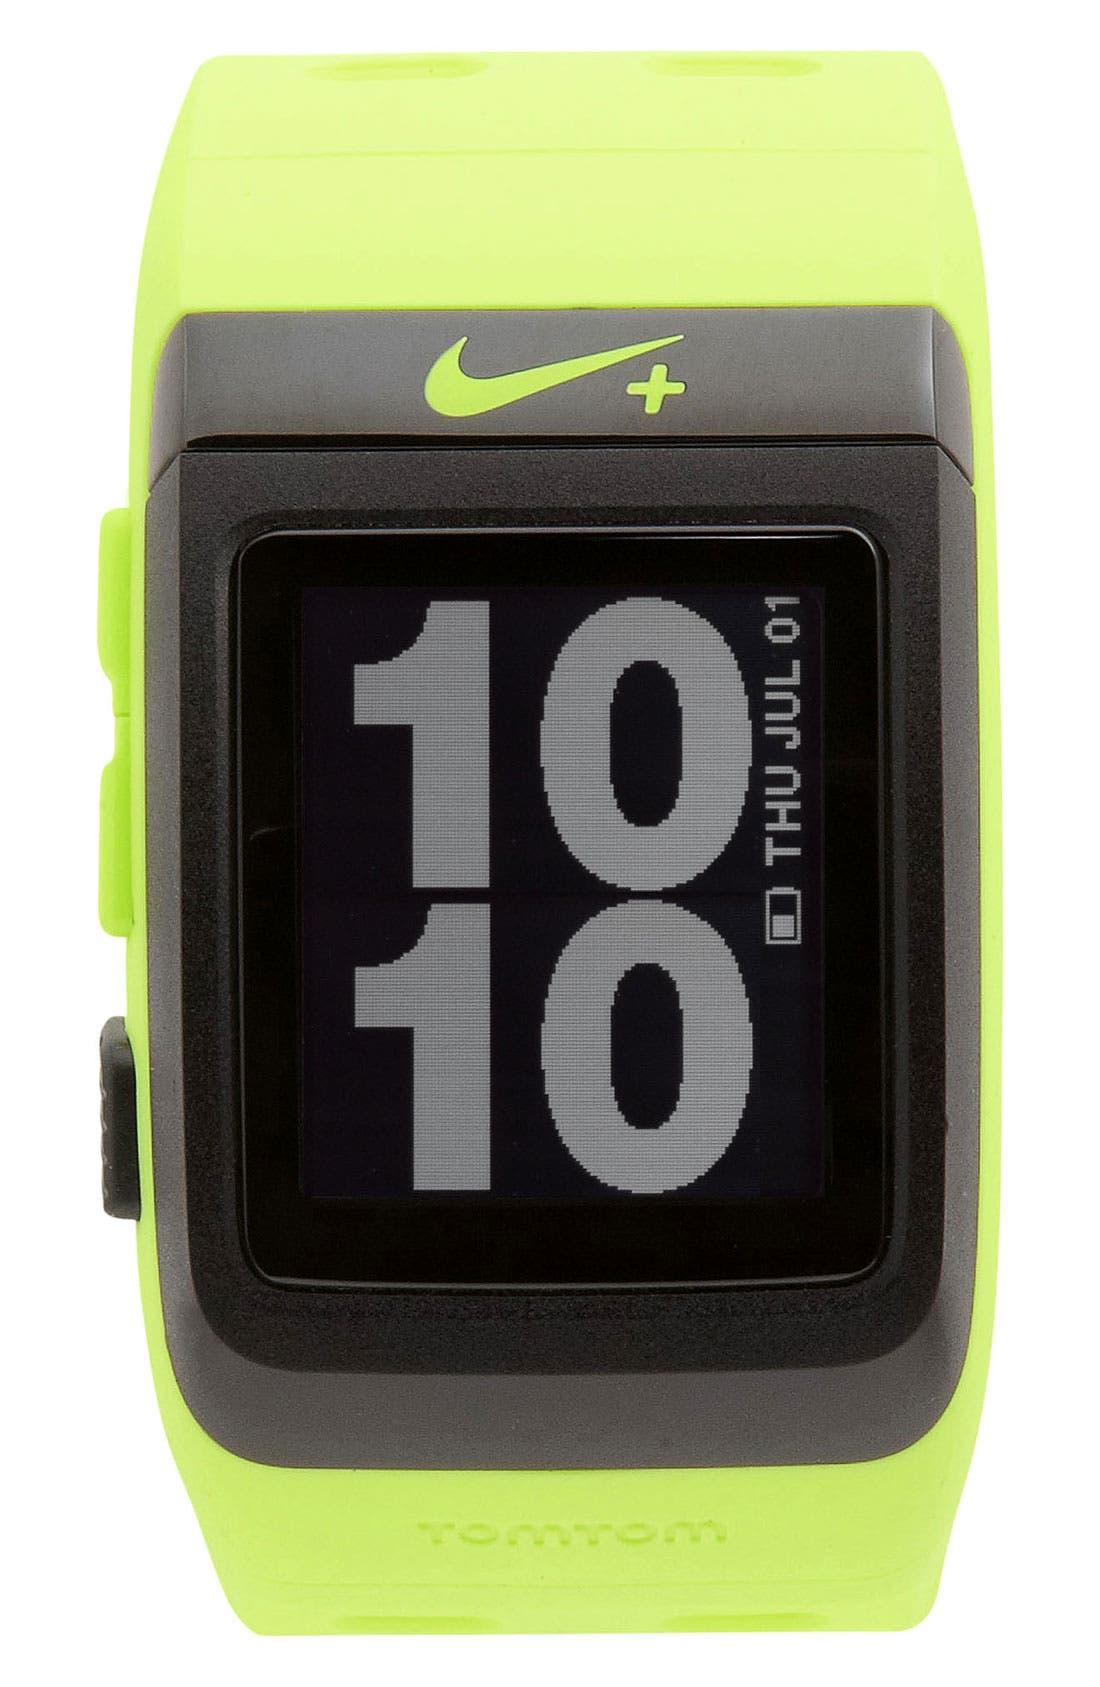 Main Image - Nike+ Sport Watch GPS, 35mm x 50mm